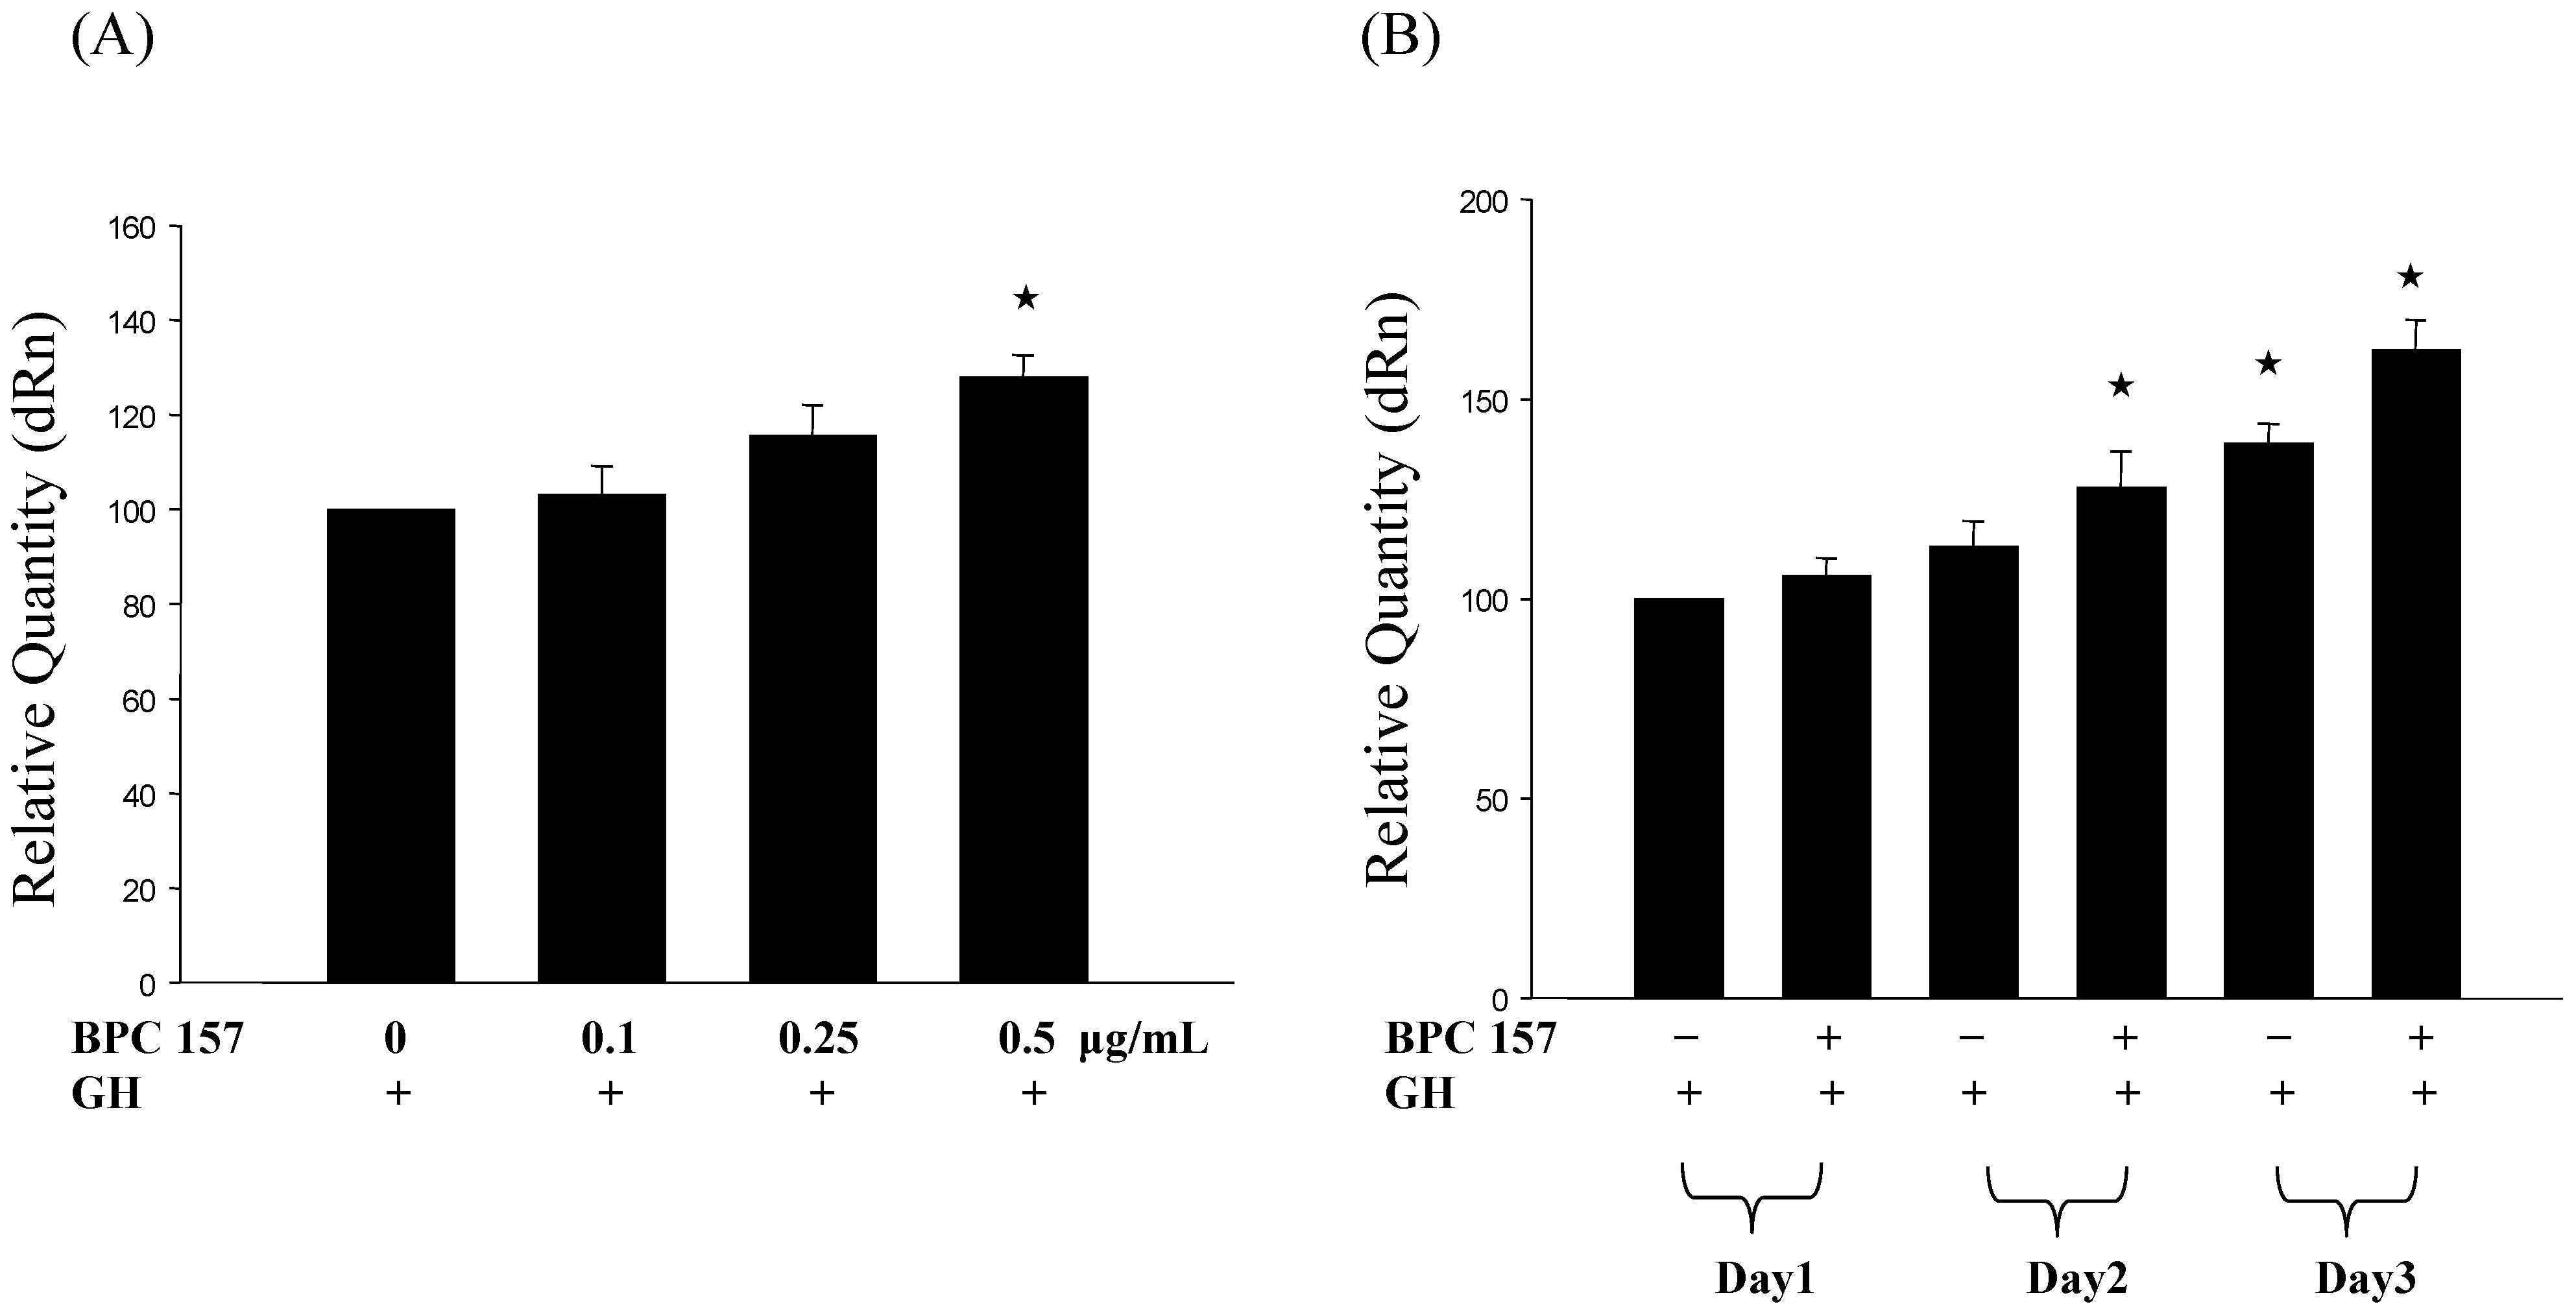 Bpc 157 dosing of cipro